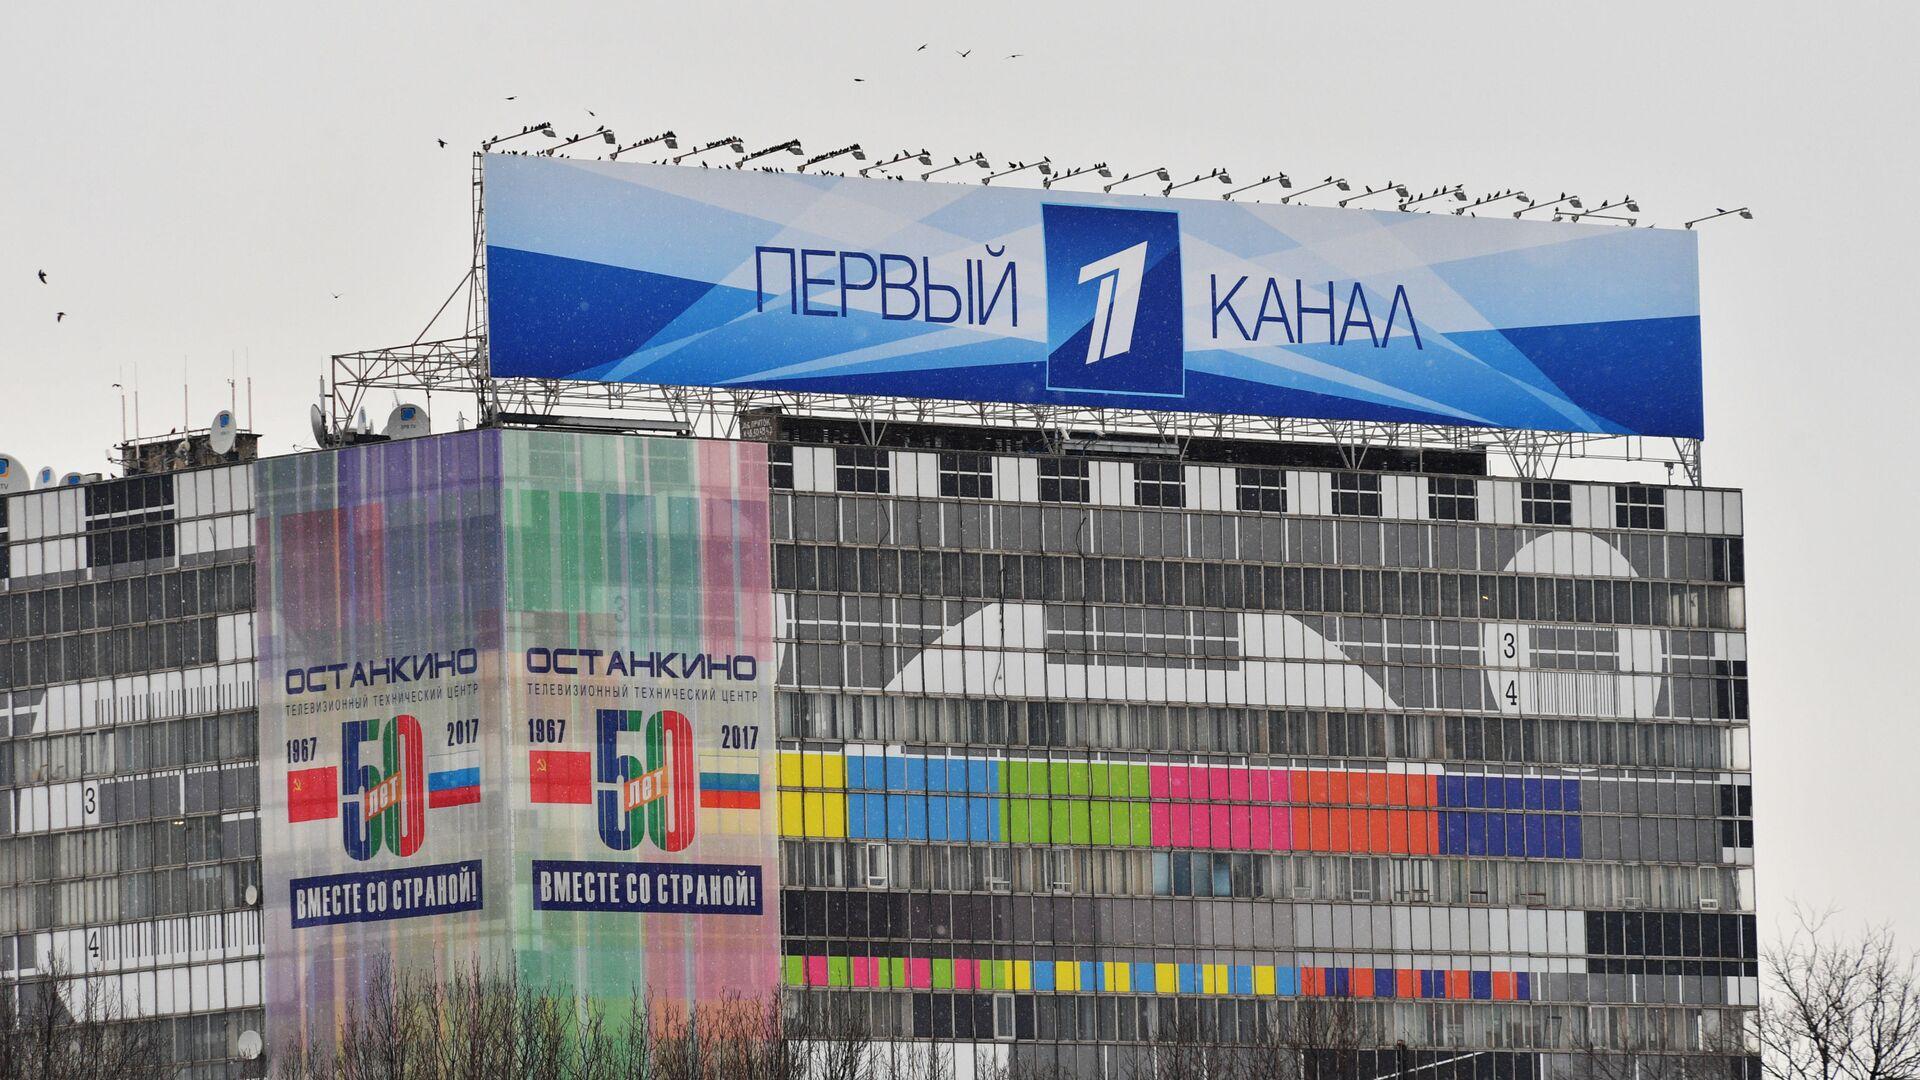 Баннер Первого канала на здании телевизионного технического центра Останкино - РИА Новости, 1920, 23.07.2021